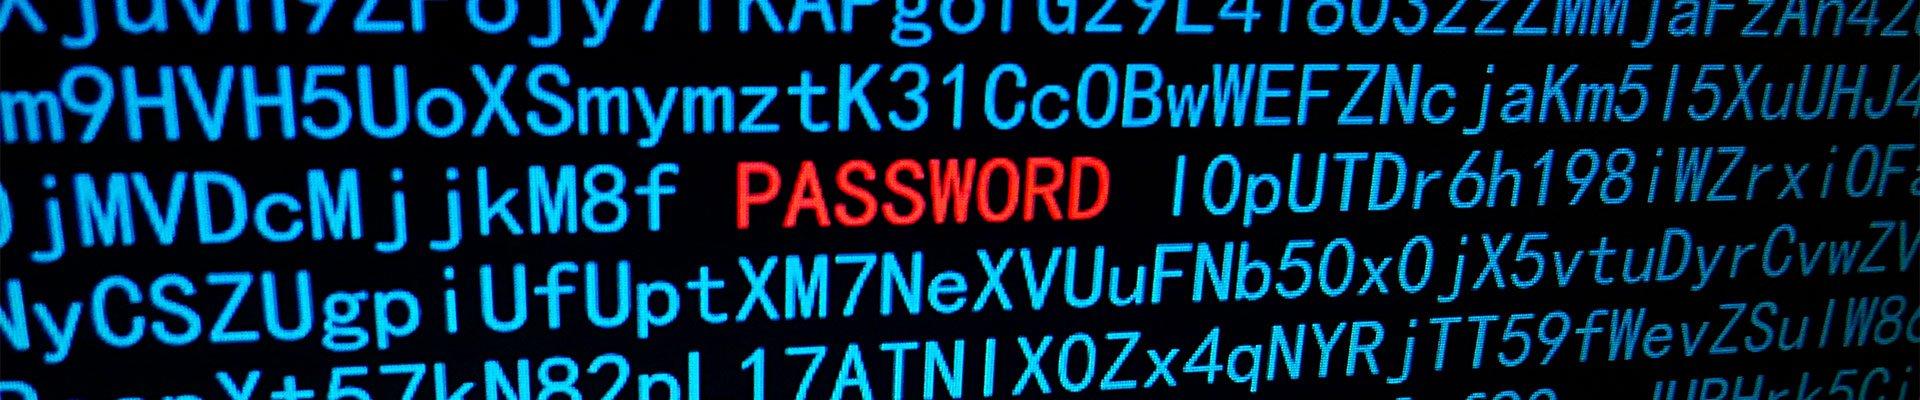 WordPress wachtwoord kwijt